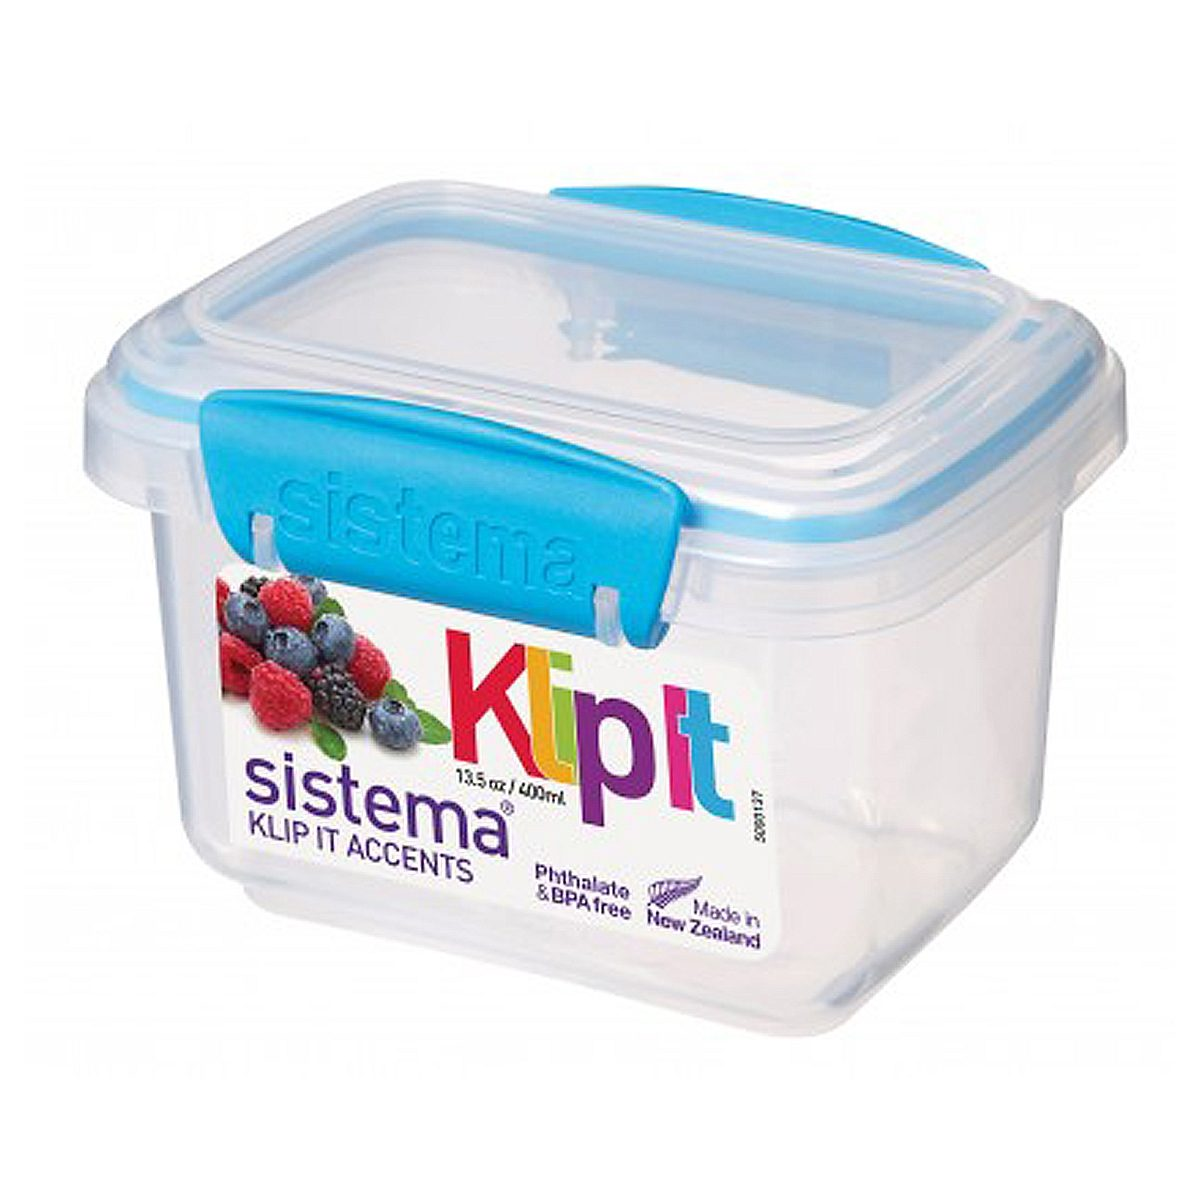 sistema sistema Frischhaltedose Klip it accents, 0.4 l blau